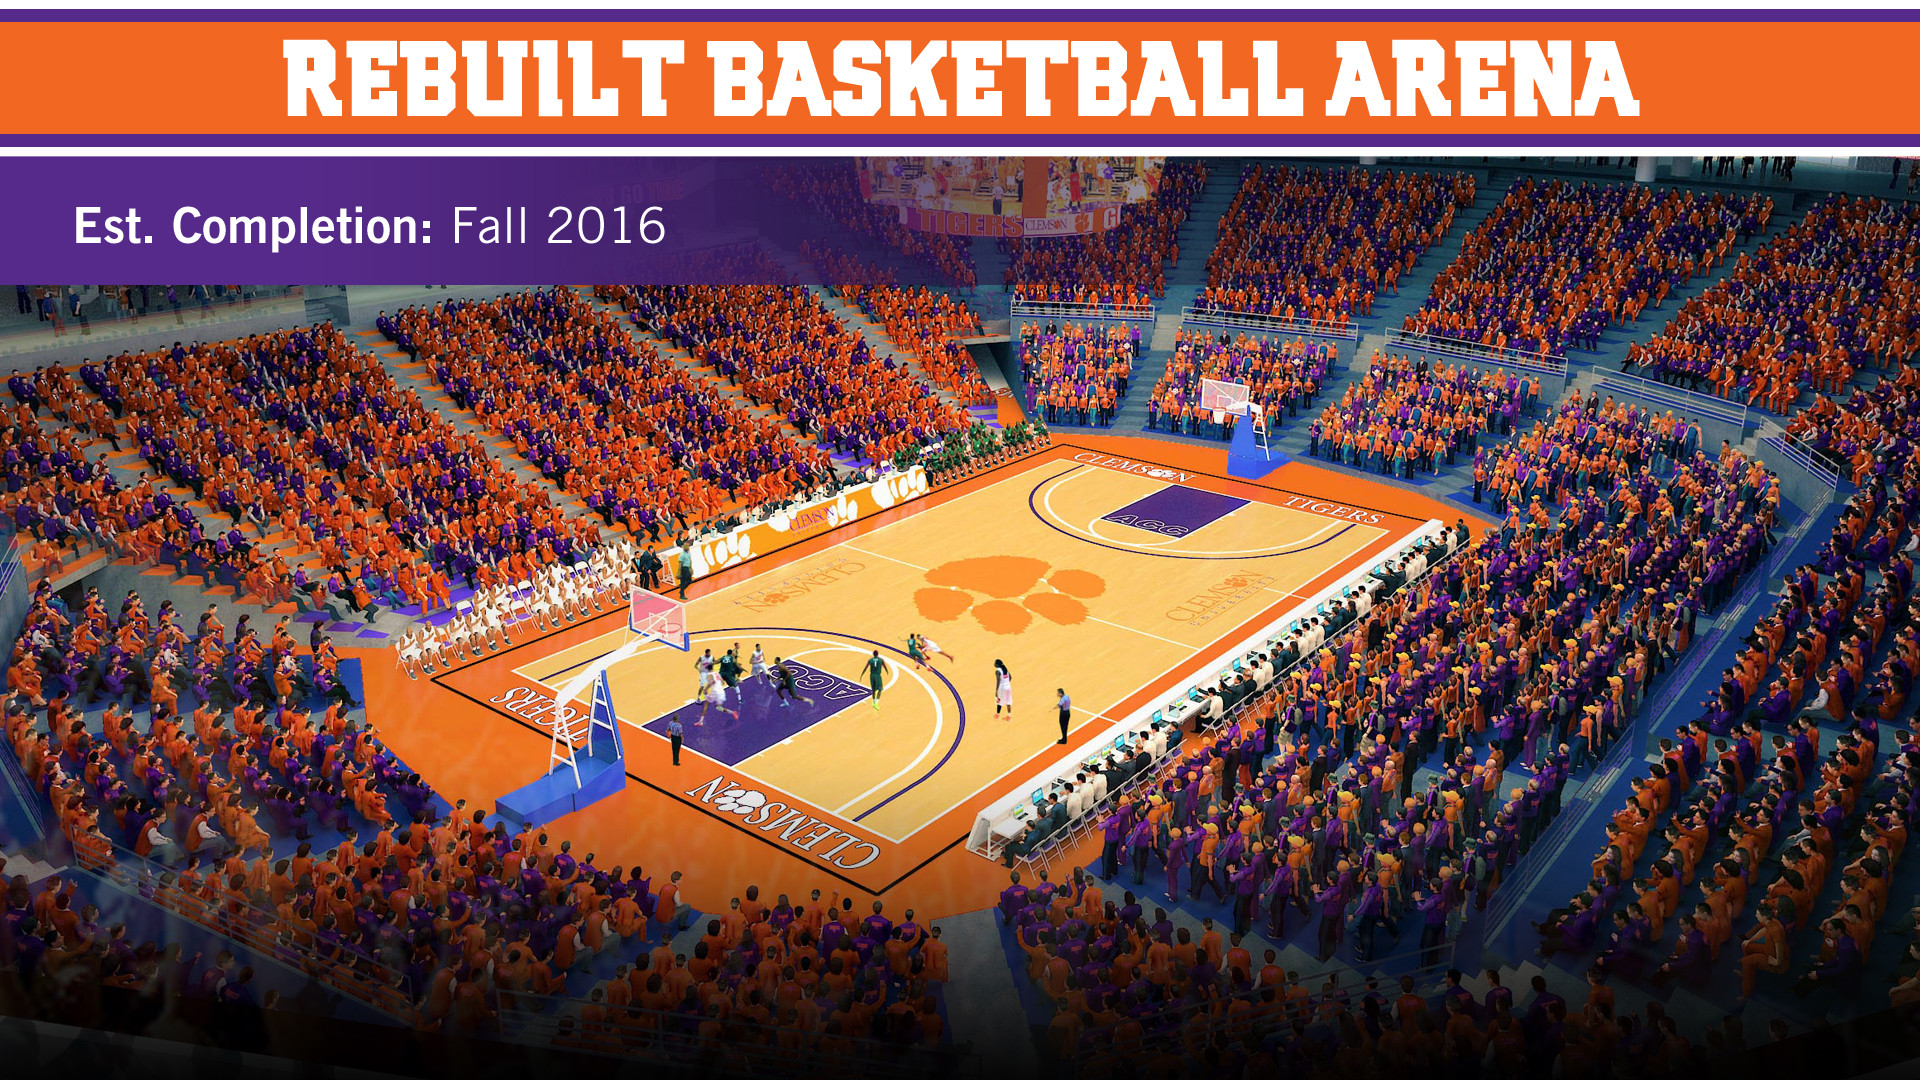 Rebuilt Basketball Arena